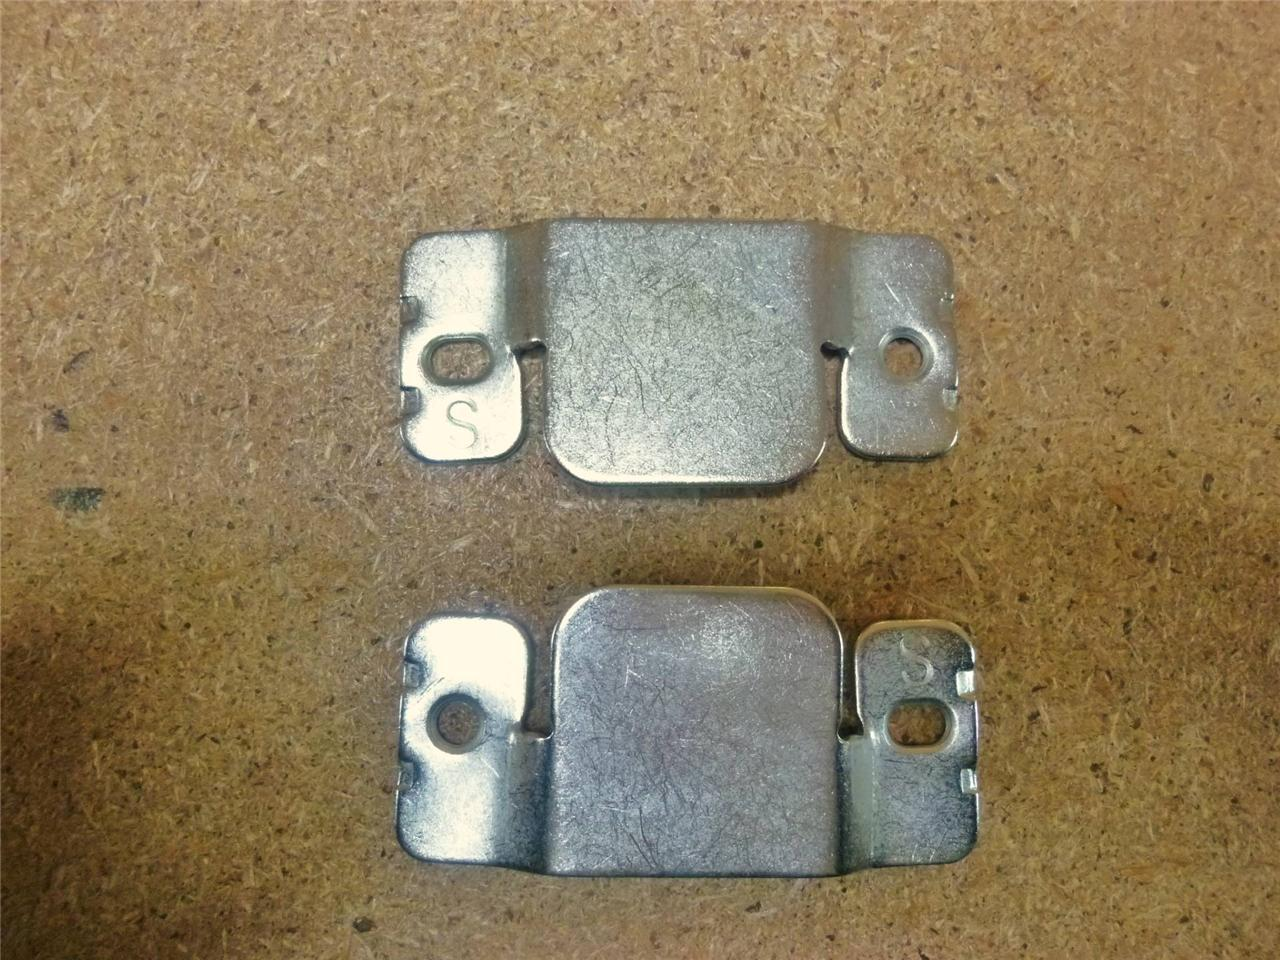 sofa spring clip strip modern furniture sleeper metal clips product categories ellbee